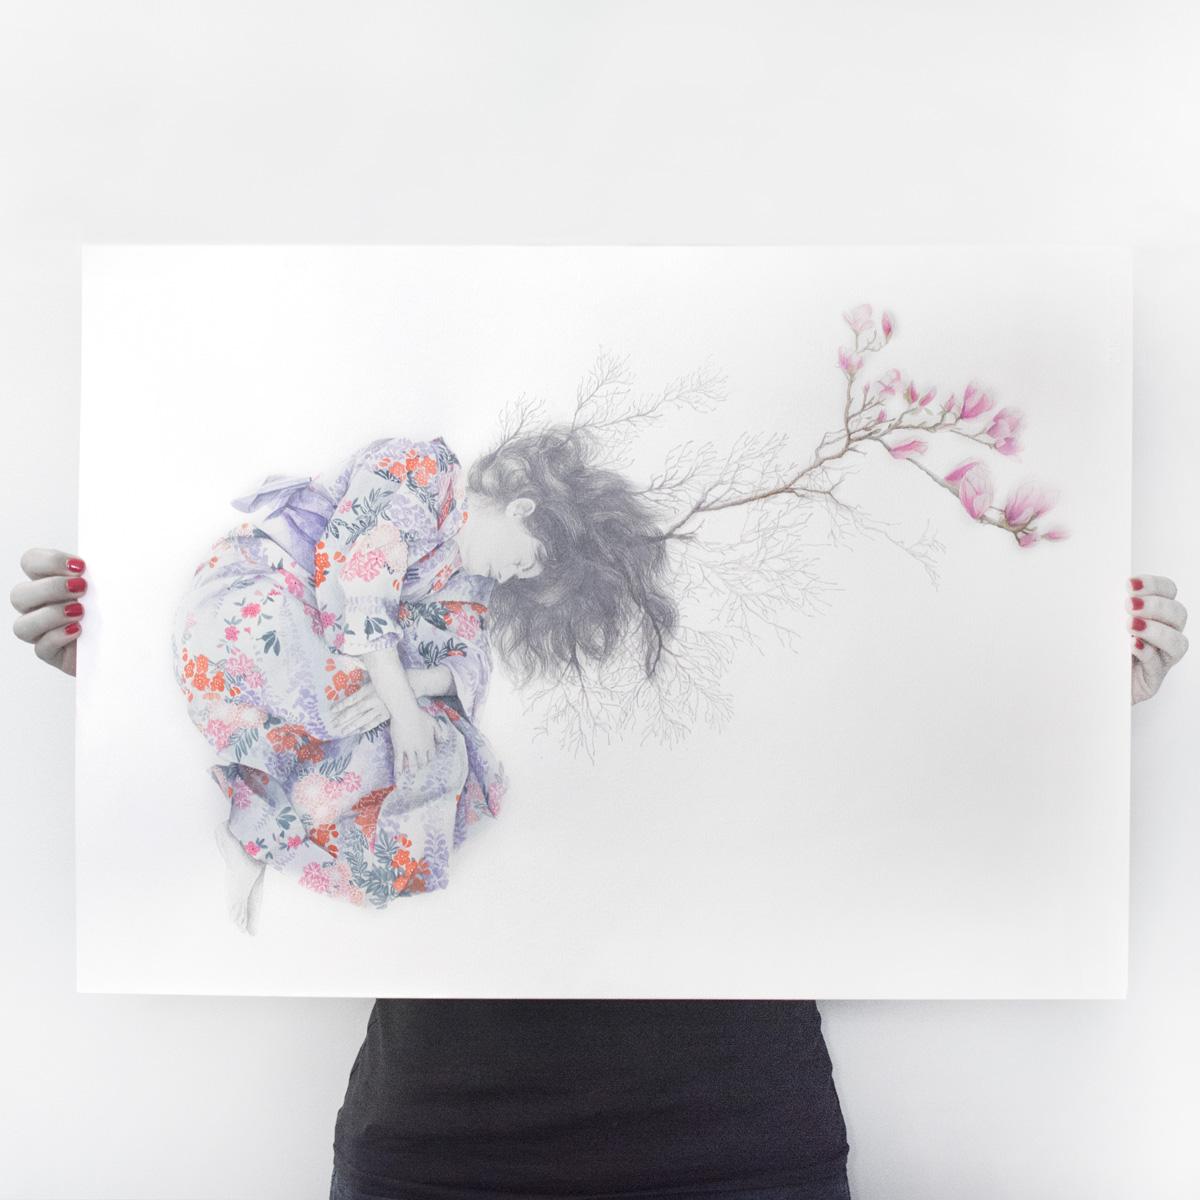 Helena_Losada_grafito_y_acuarela